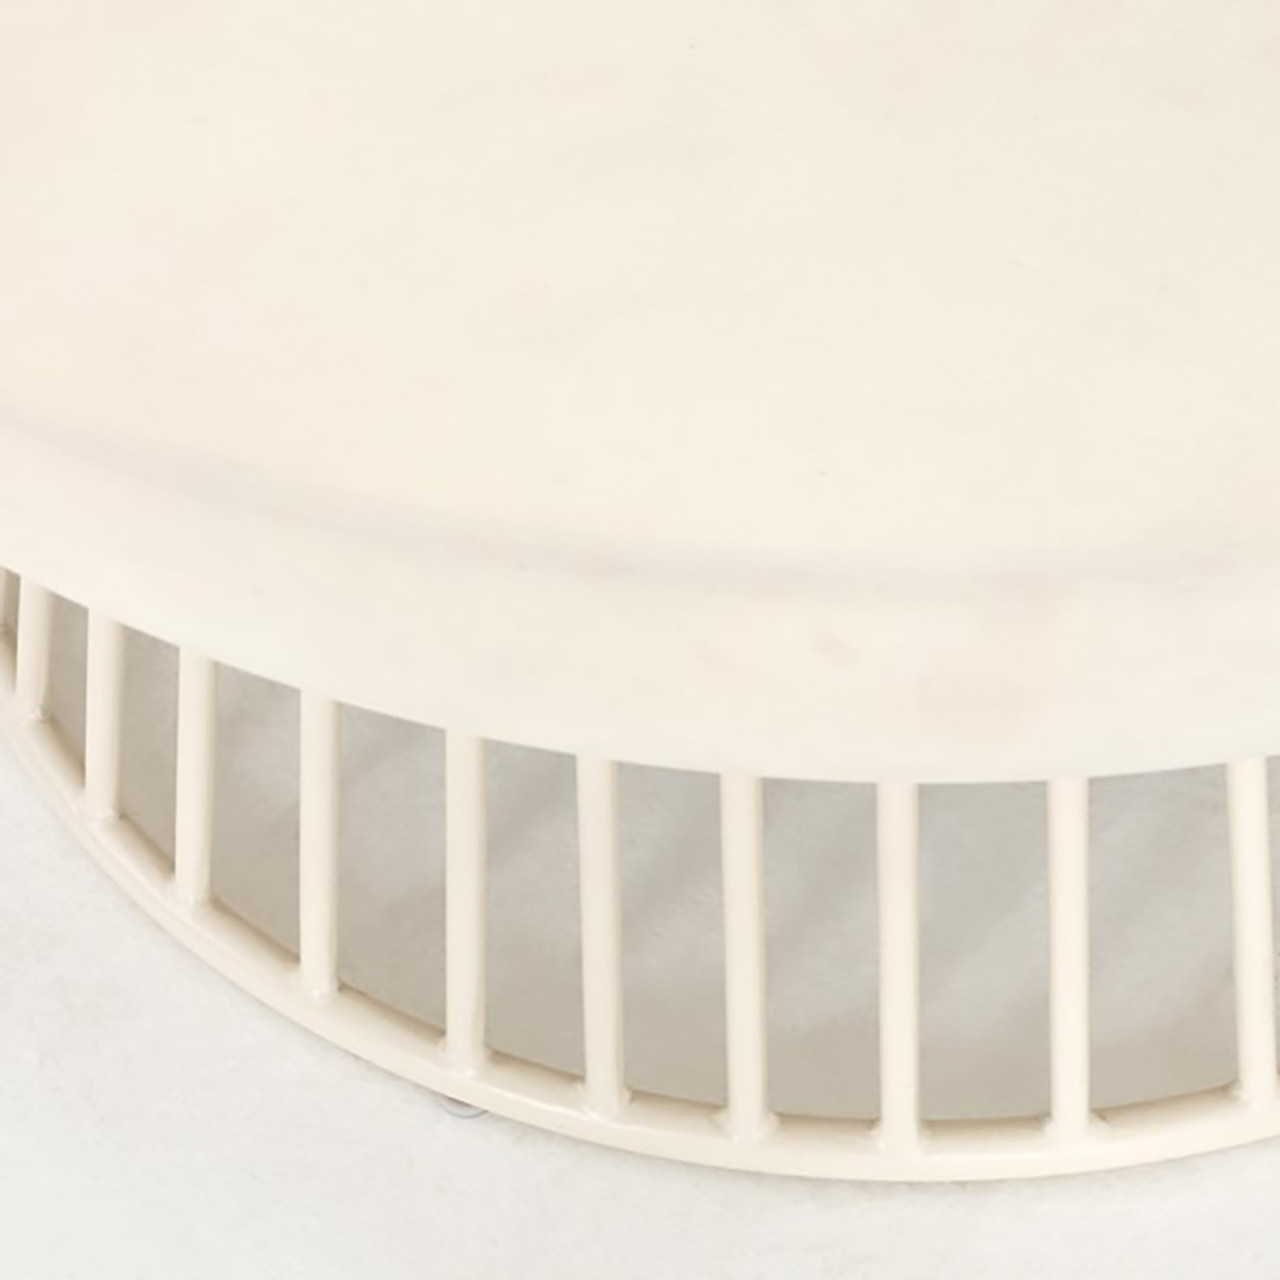 Den Coffee Table - White Concrete